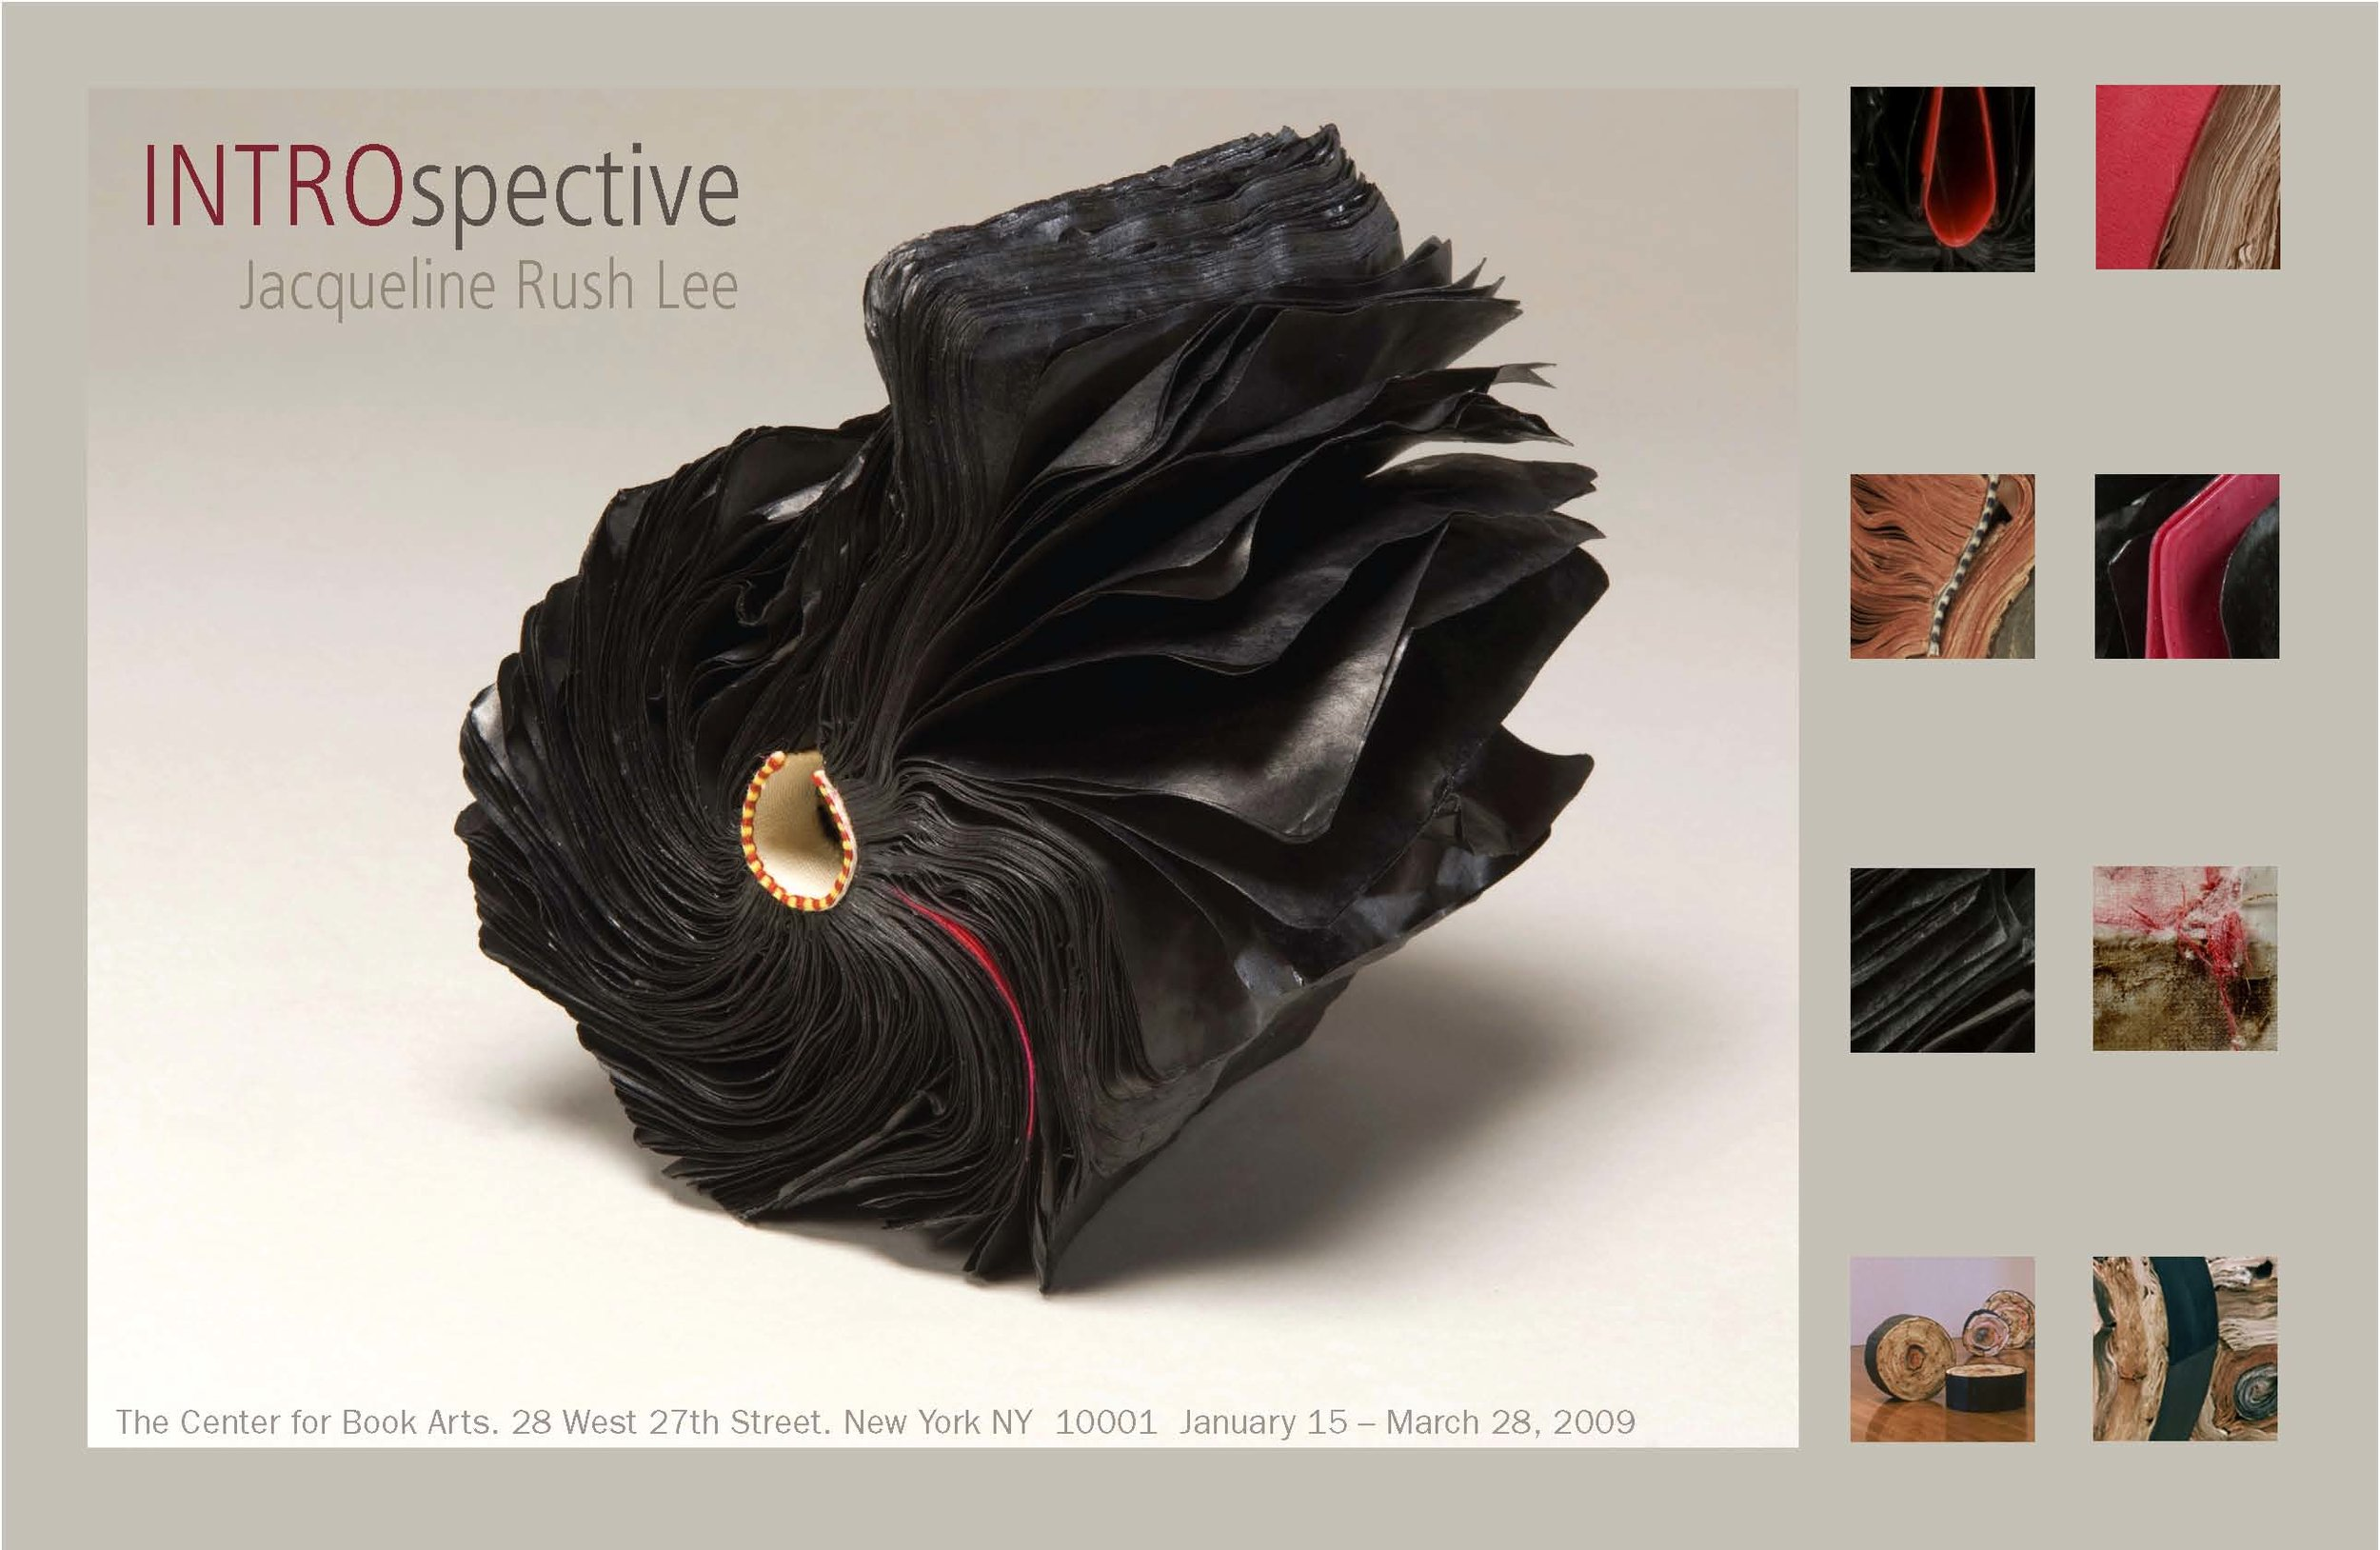 INTROspective-featuredartist1.jpg